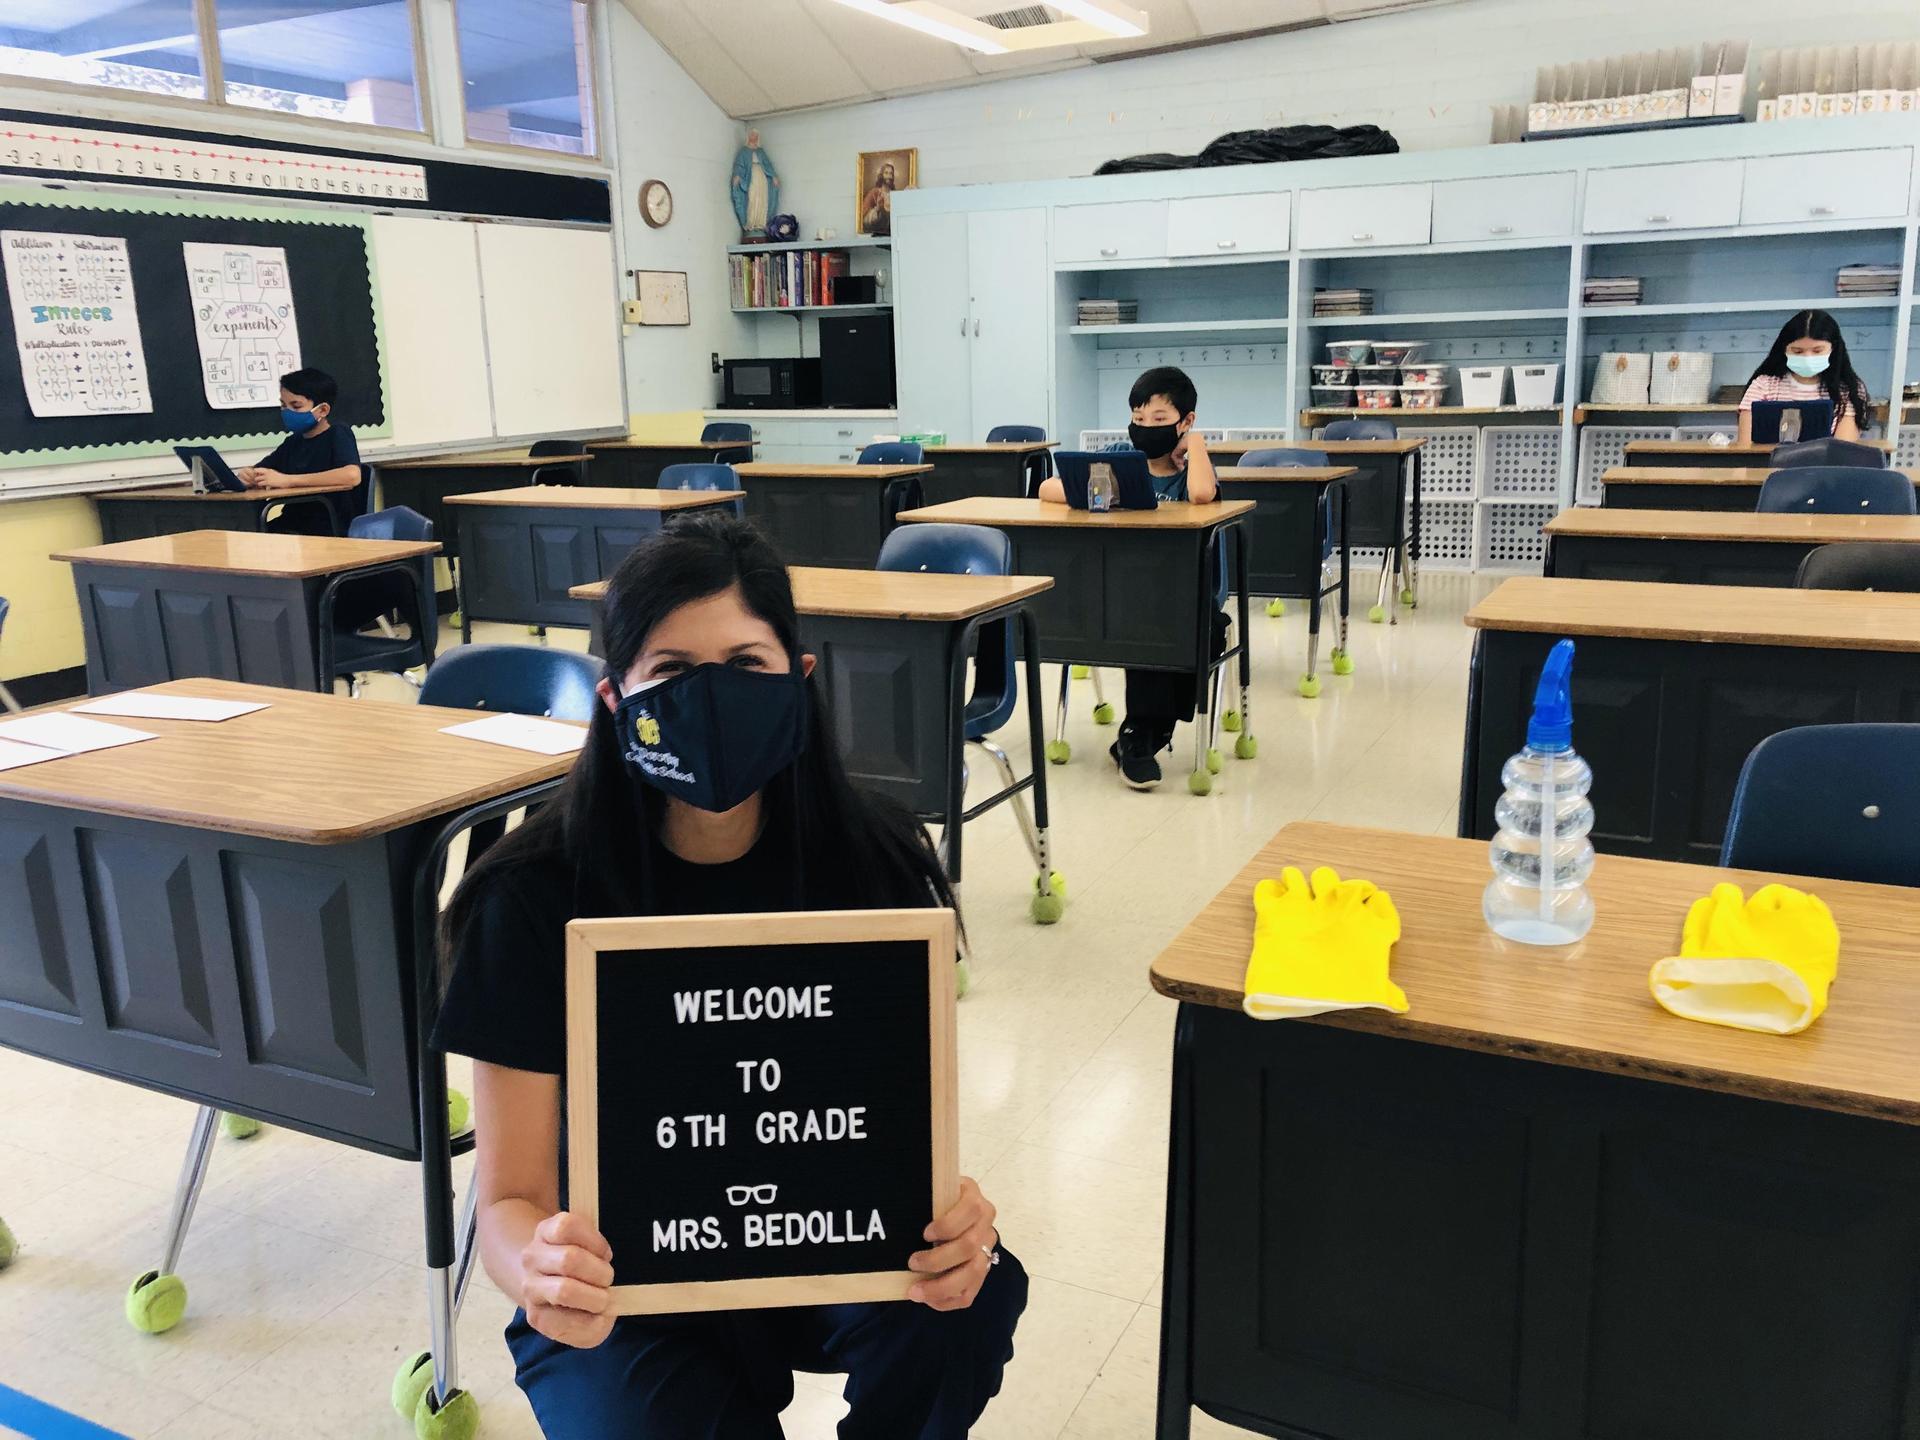 Sixth grade teacher, Mrs. Bedolla, welcoming students